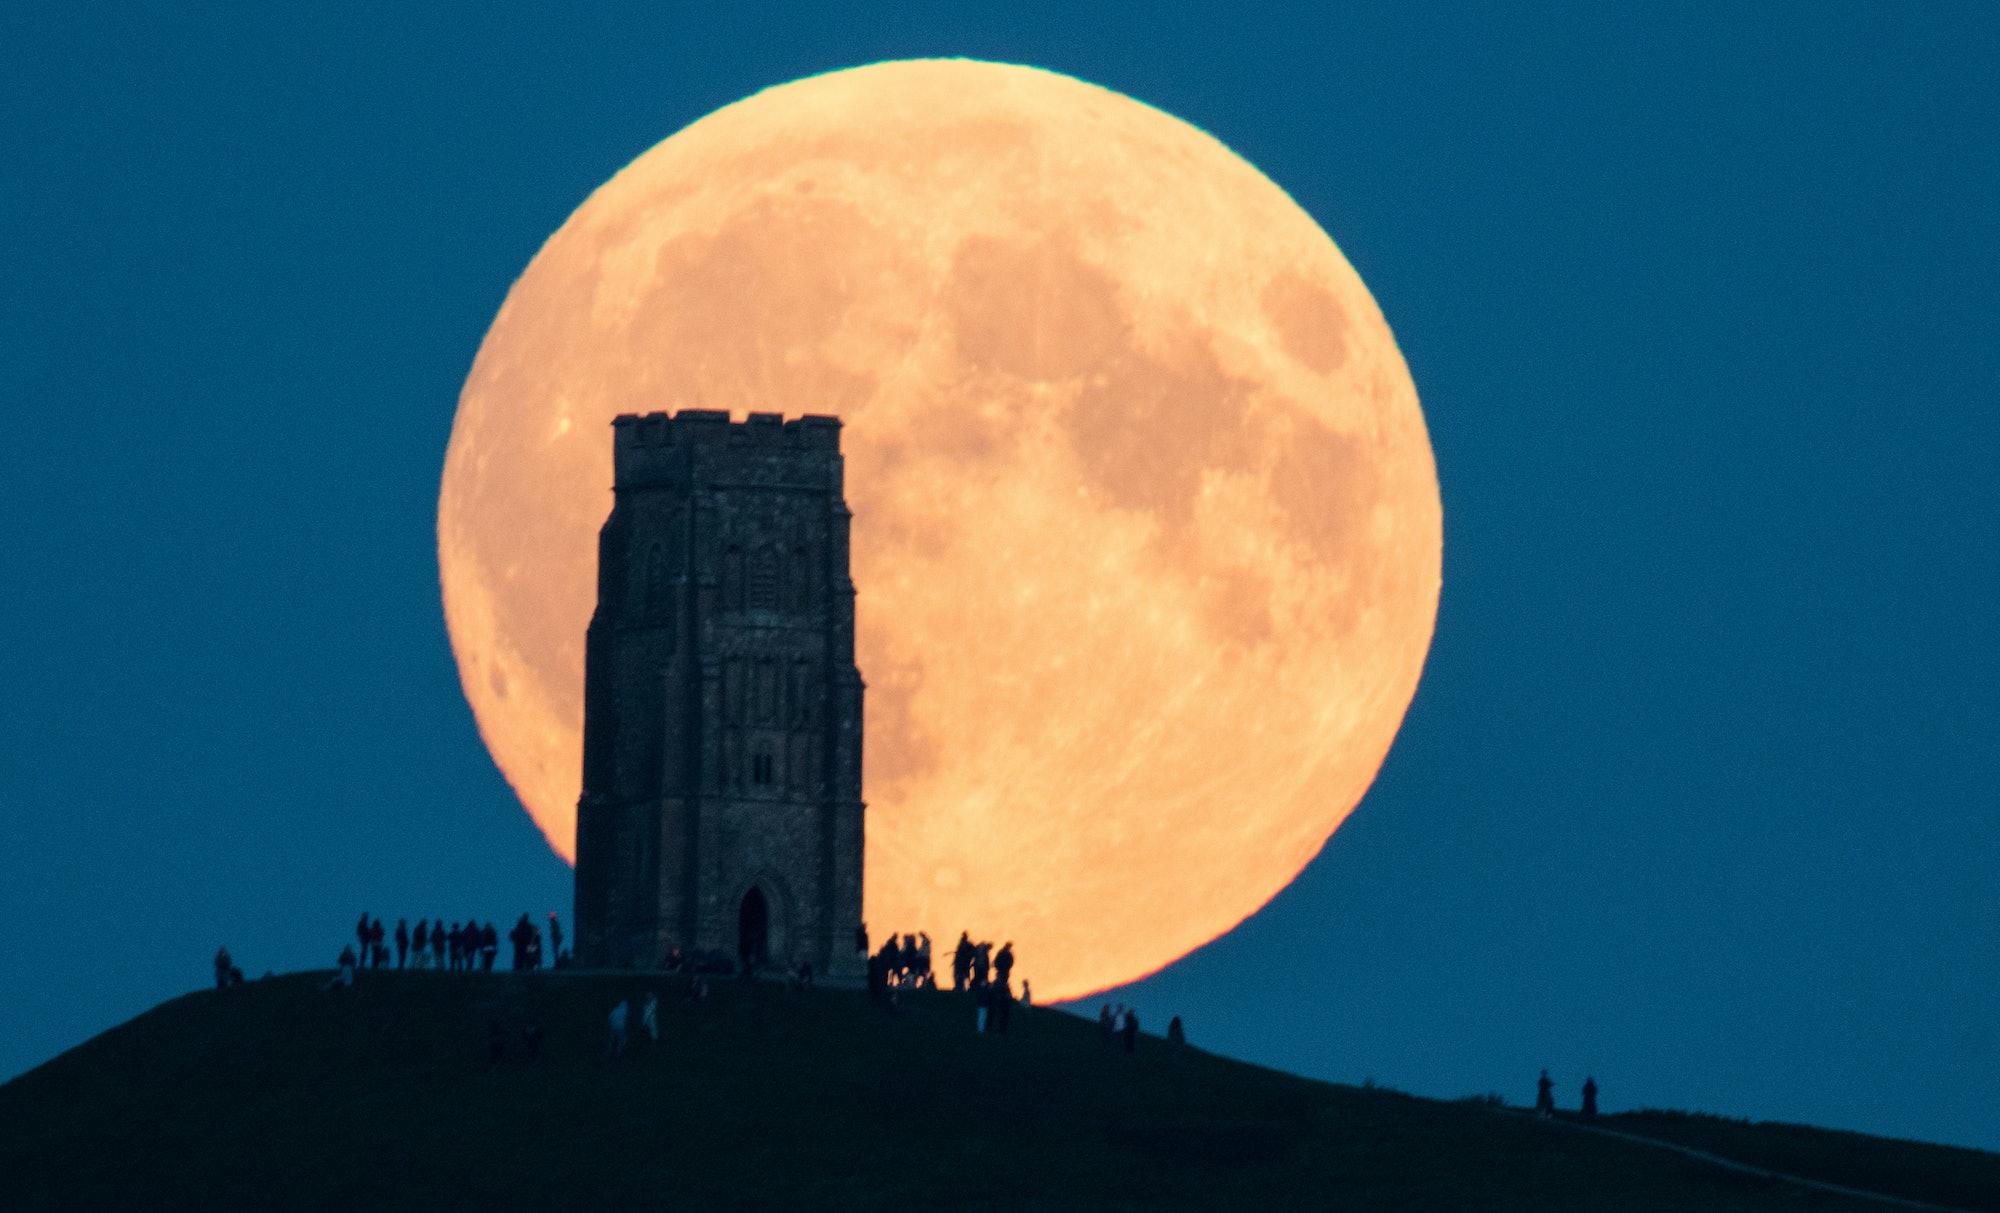 The supermoon rises behind Glastonbury Tor on September 28.